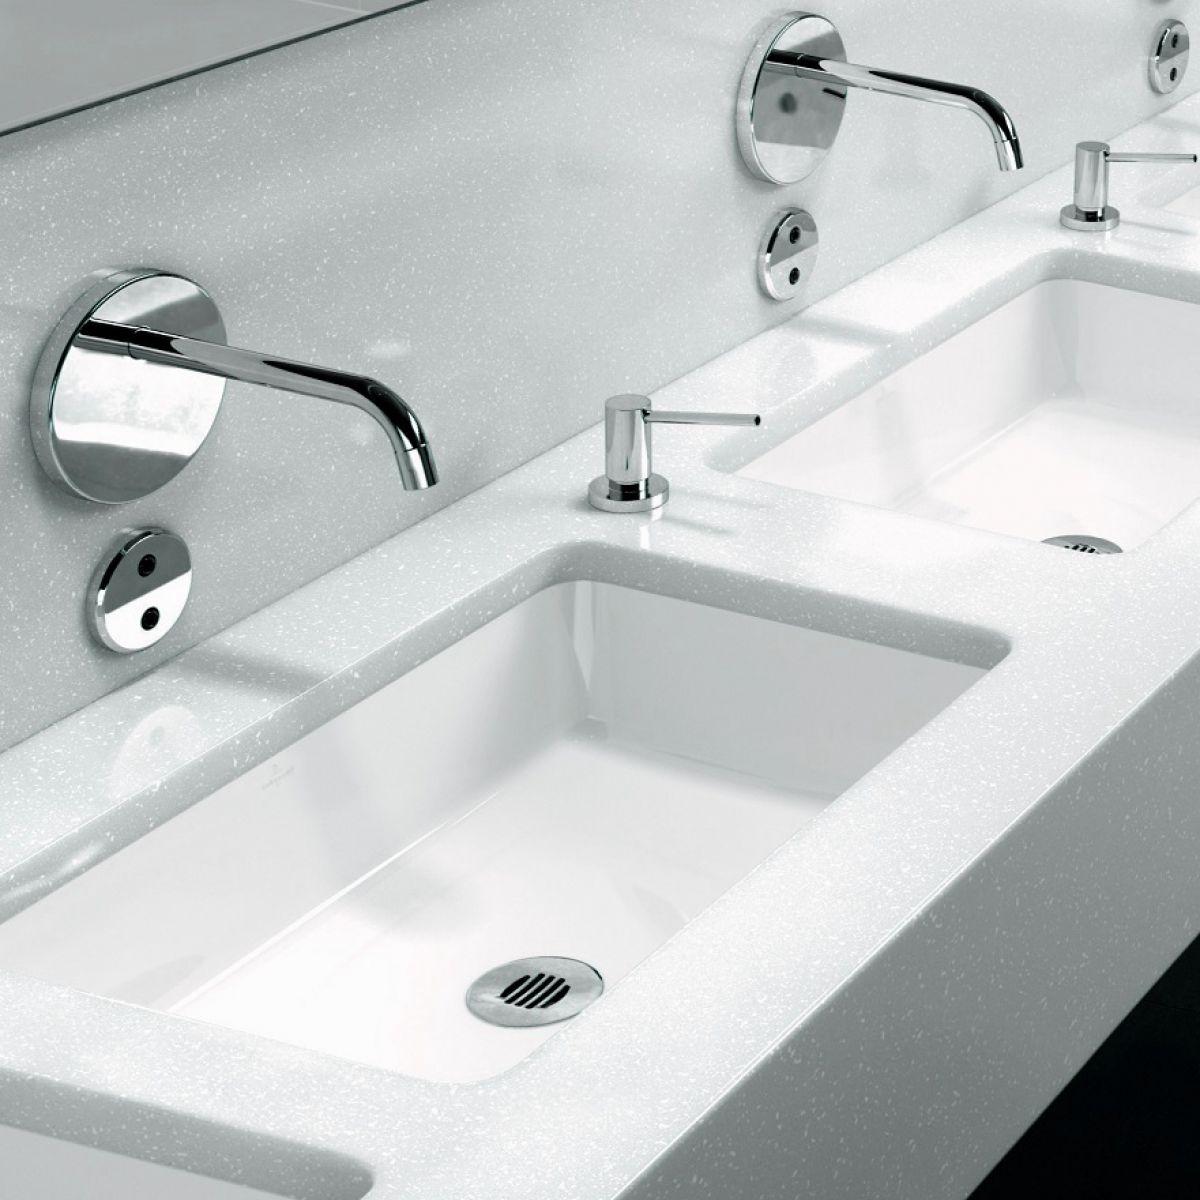 v b architectura undercounter basin uk bathrooms. Black Bedroom Furniture Sets. Home Design Ideas